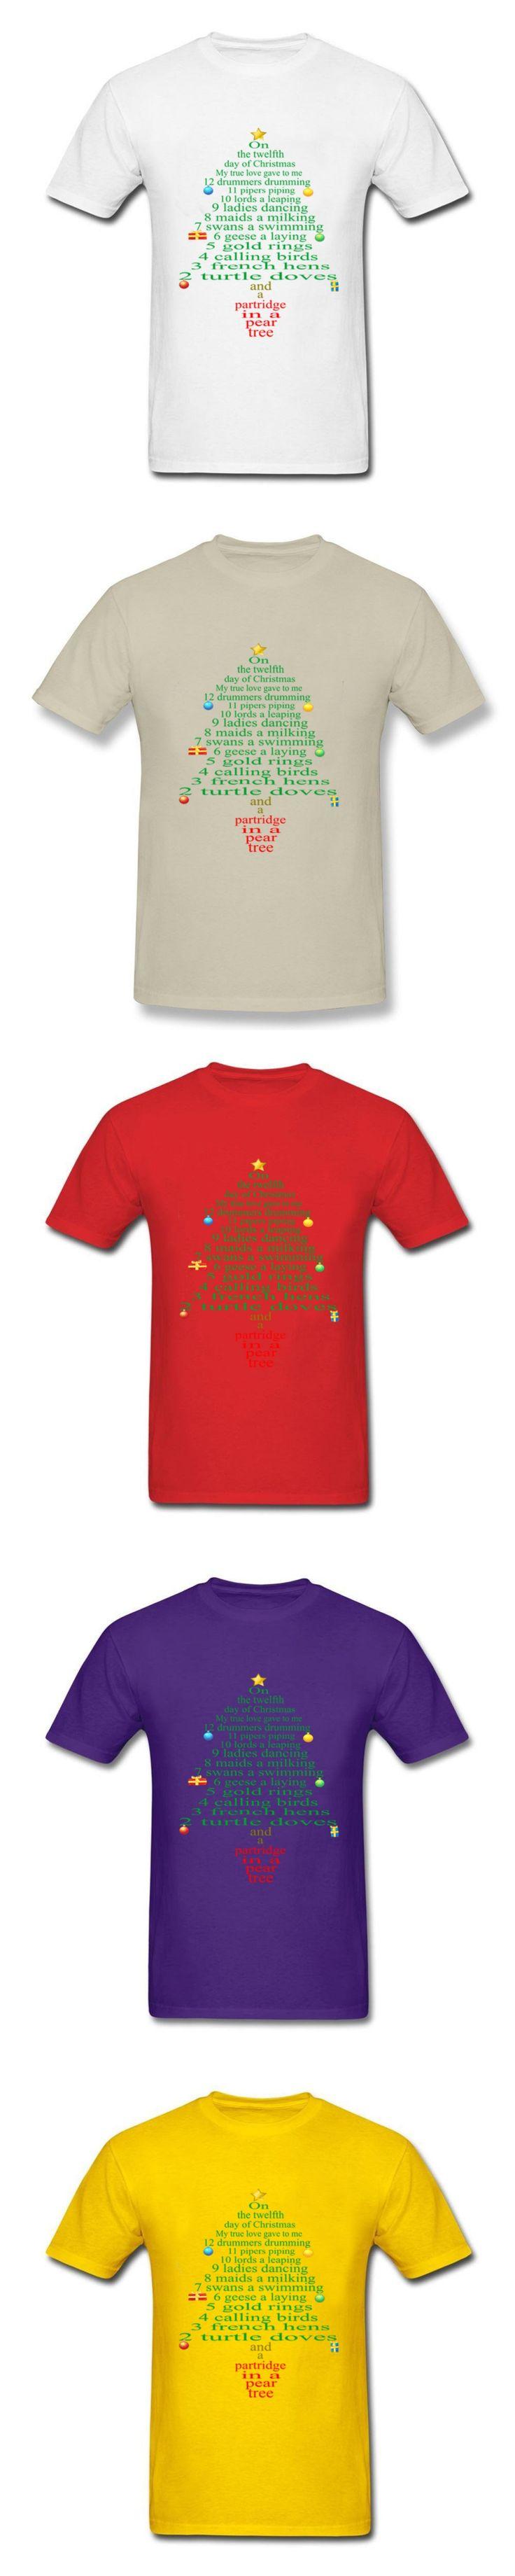 Newest 12 day of christmas lyrics Mens T Shirts  Sale Shirt And Tshirt Crewneck Short Sleeve men T Shirts size xs-xxxl